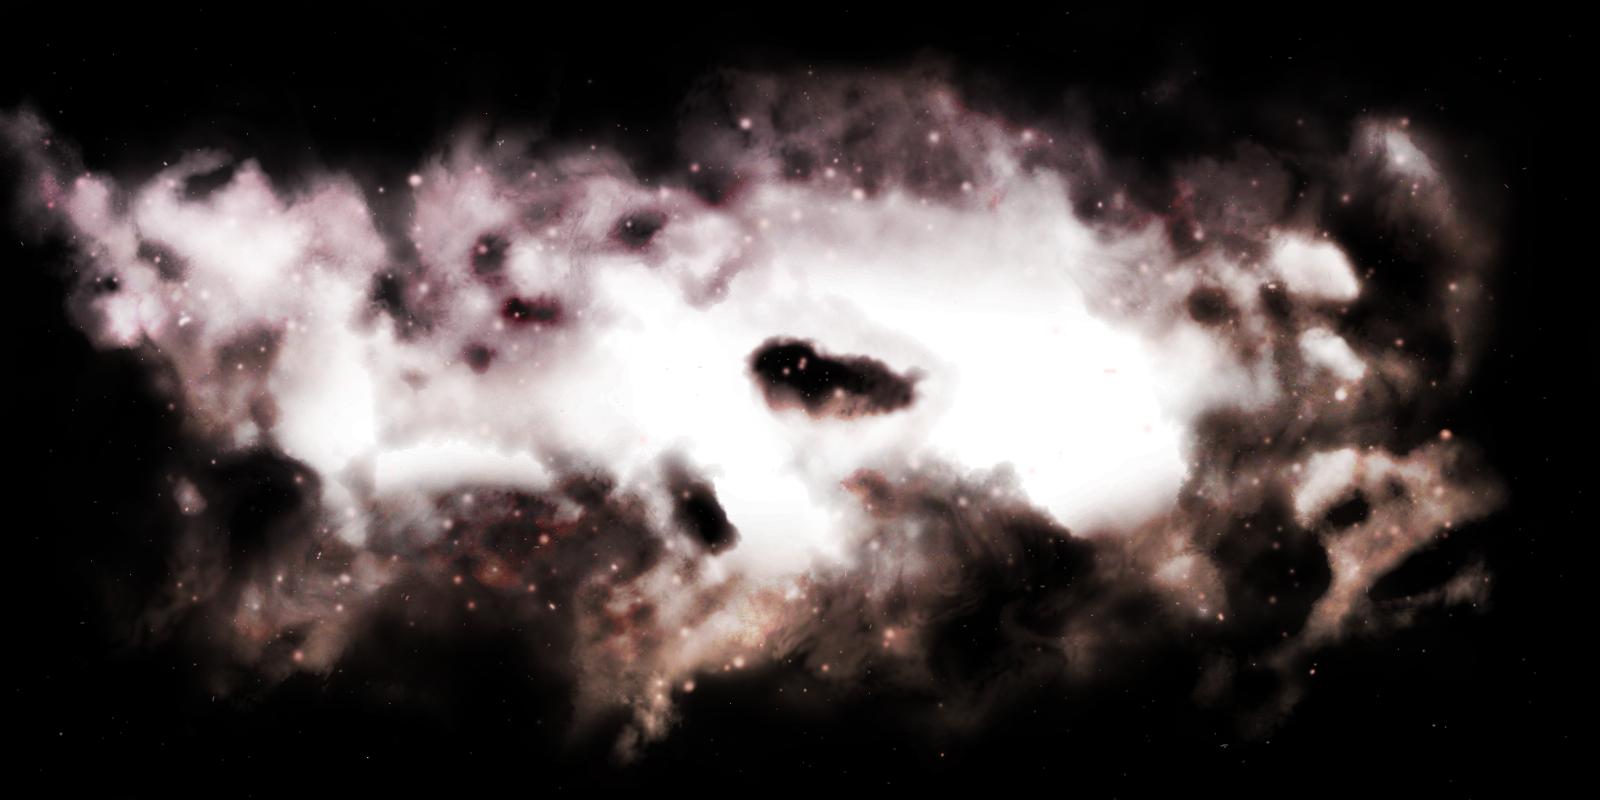 Weird galaxy by Destinaetus